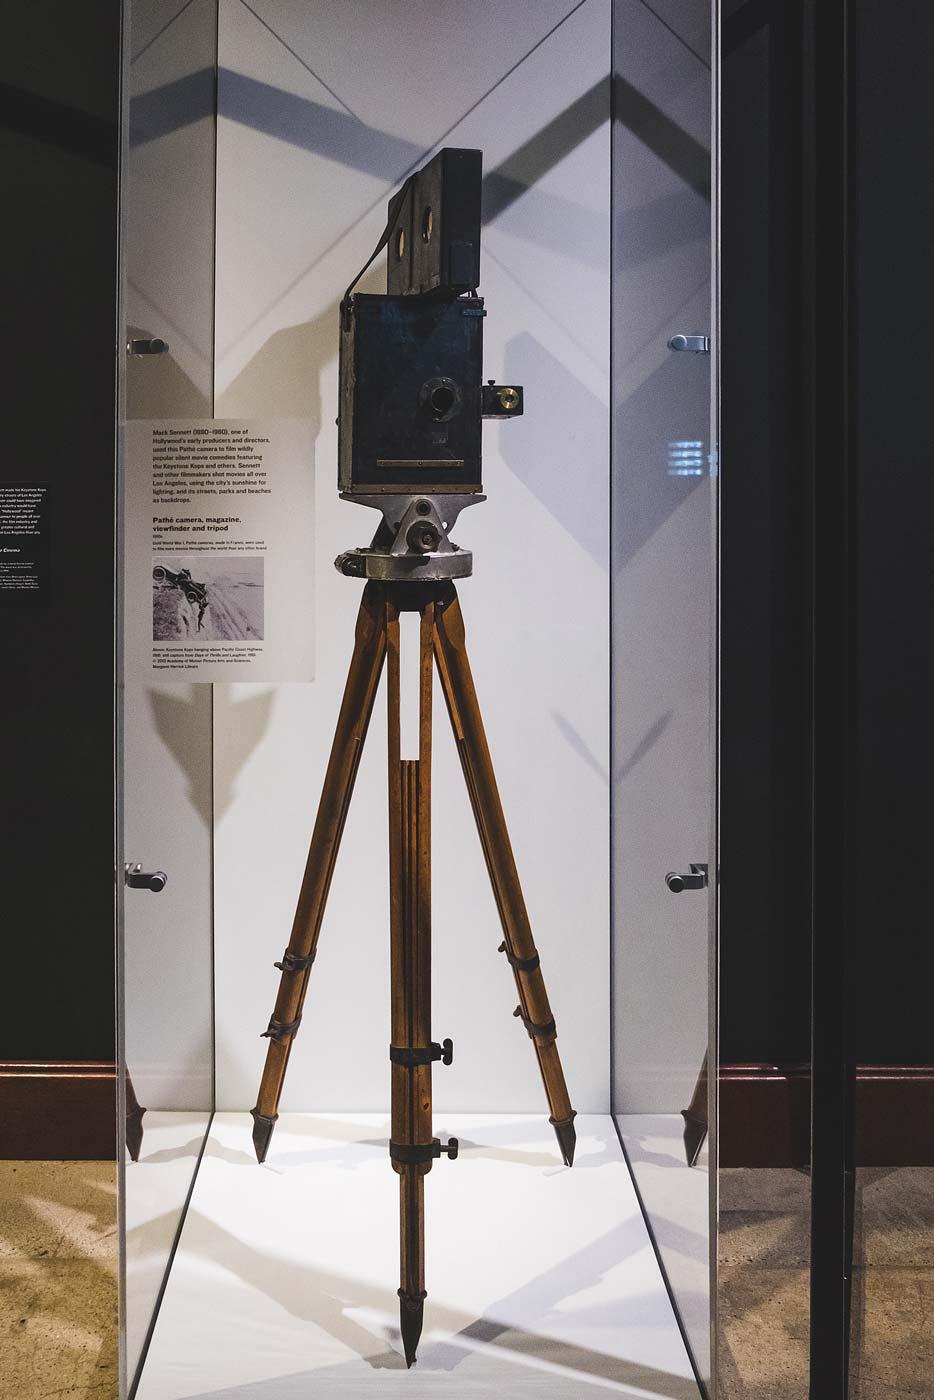 sNatural-History-Museum---Feb-2017-39.jpg